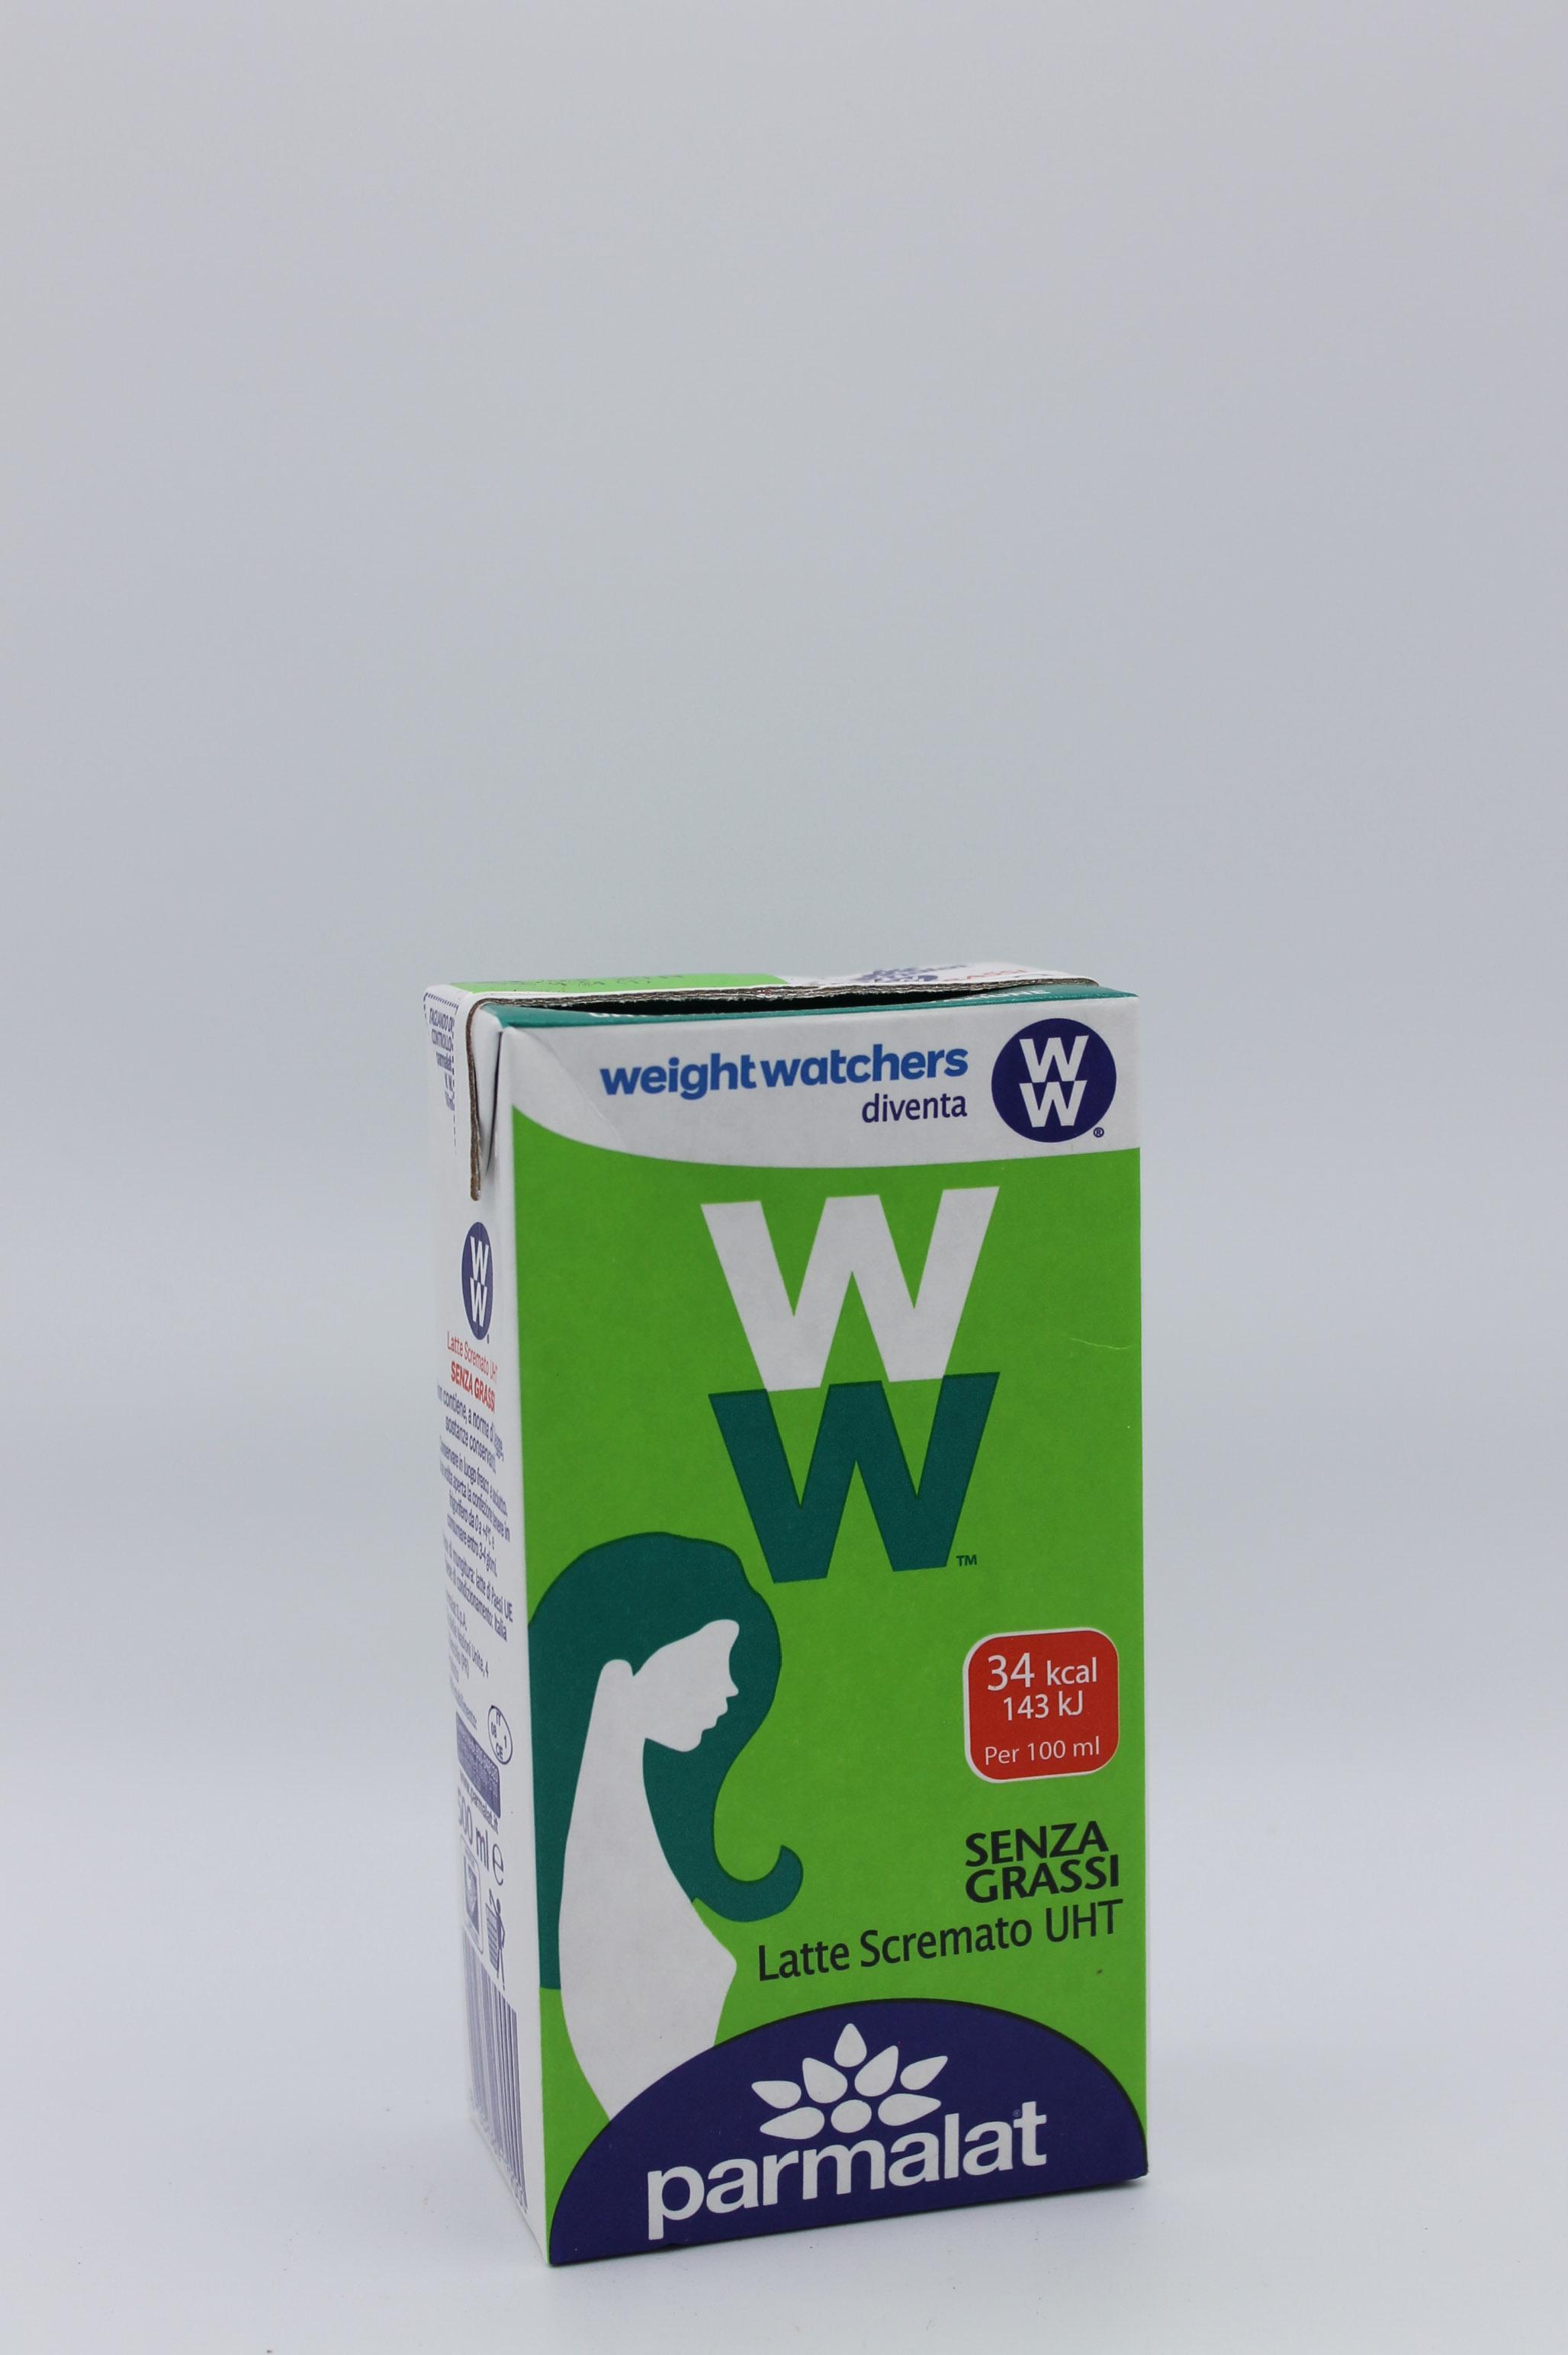 Parmalat latte uht scremato 500 ml.